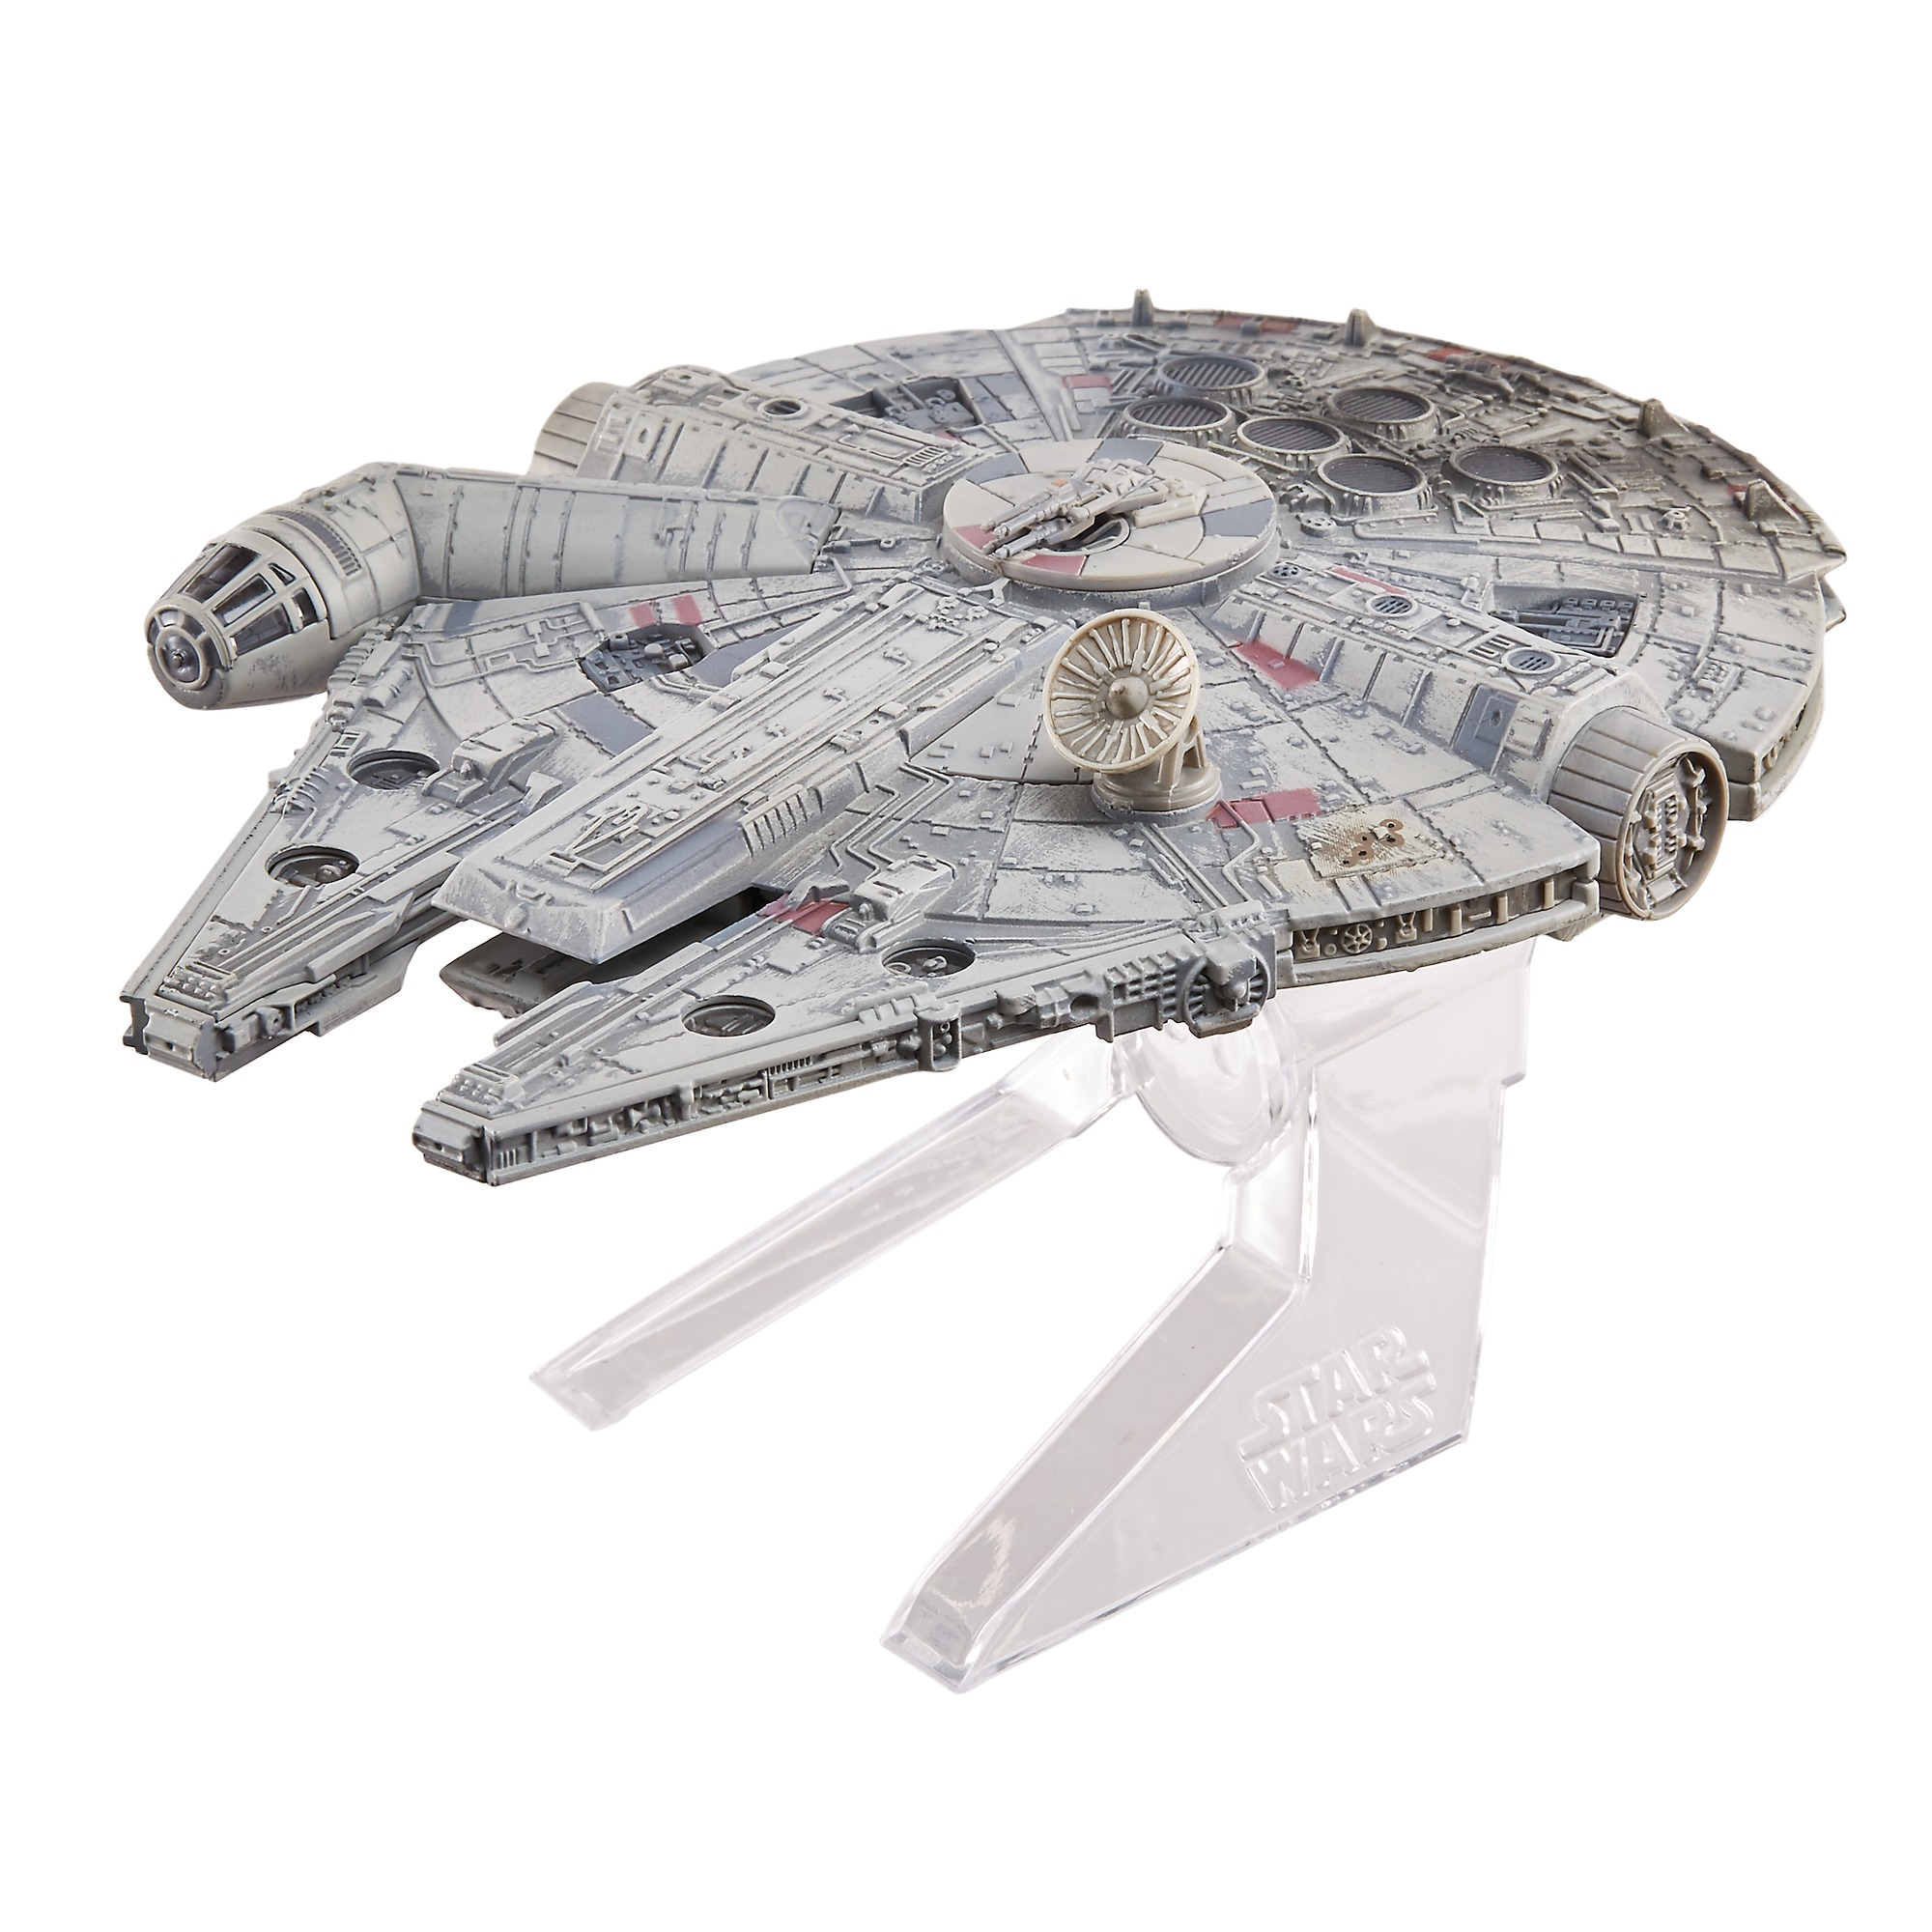 ANH HW Millennium Falcon Adventure Starship 2